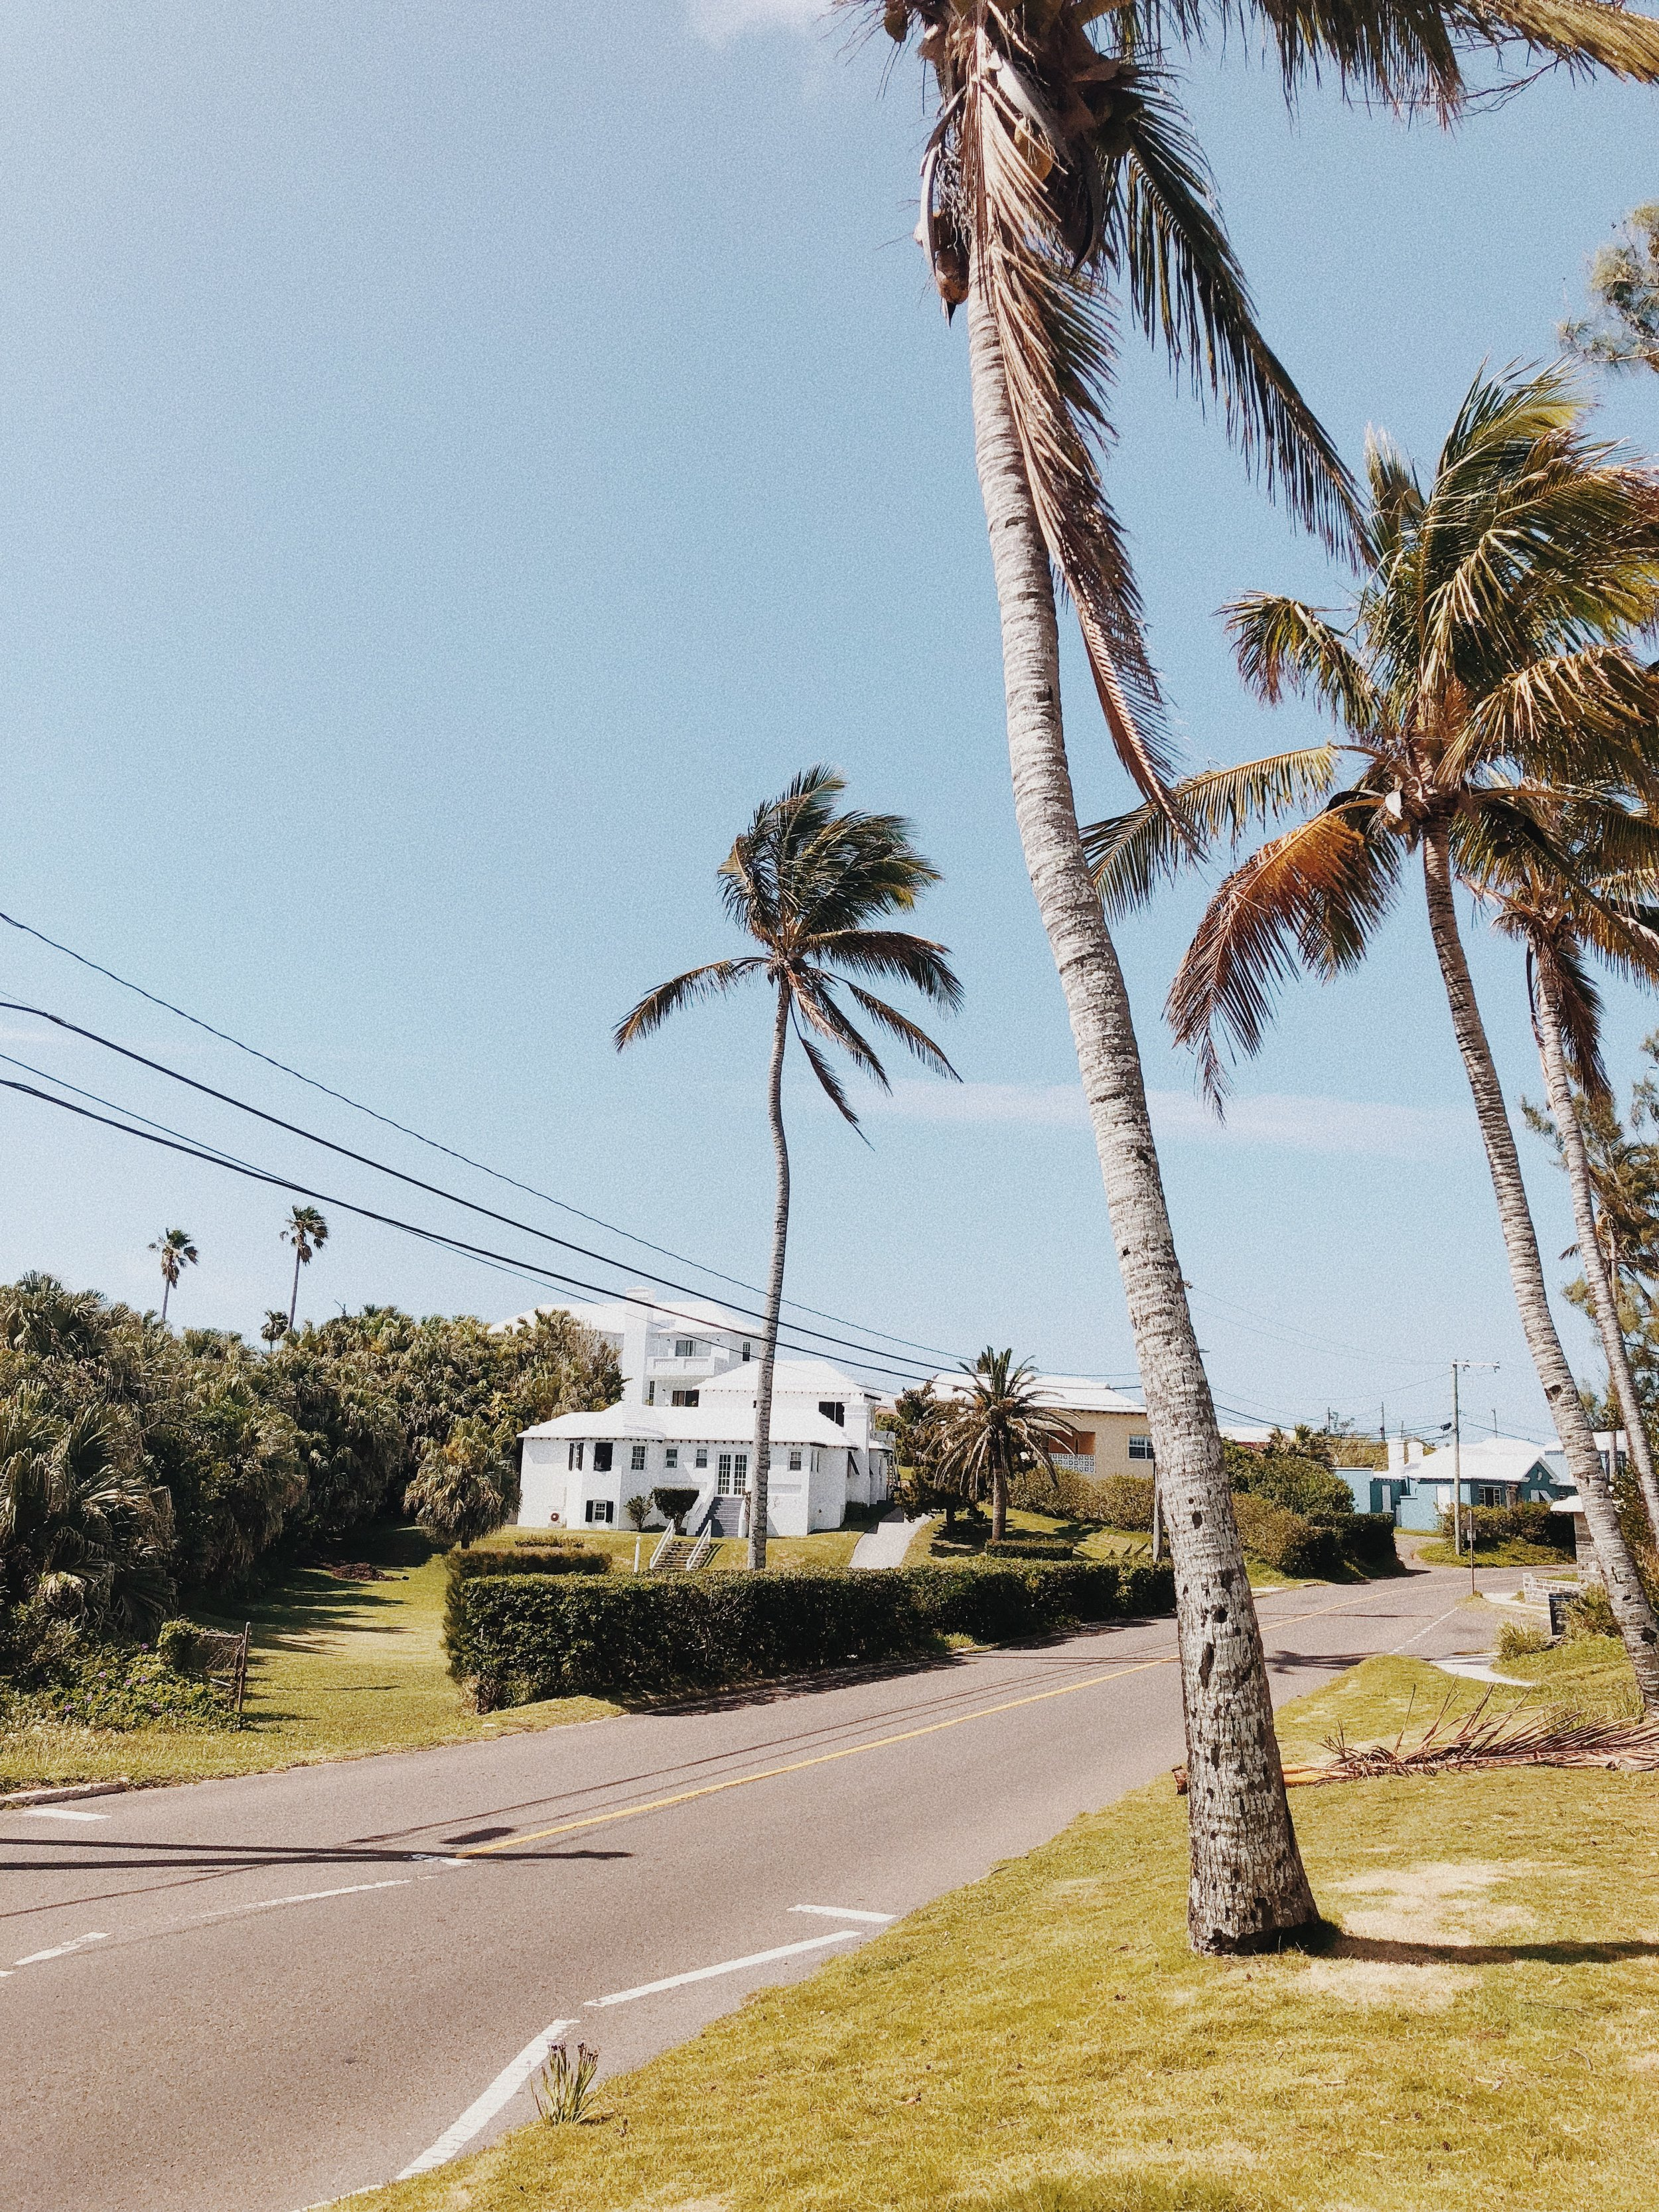 BERMUDA  | PALMS AHEAD